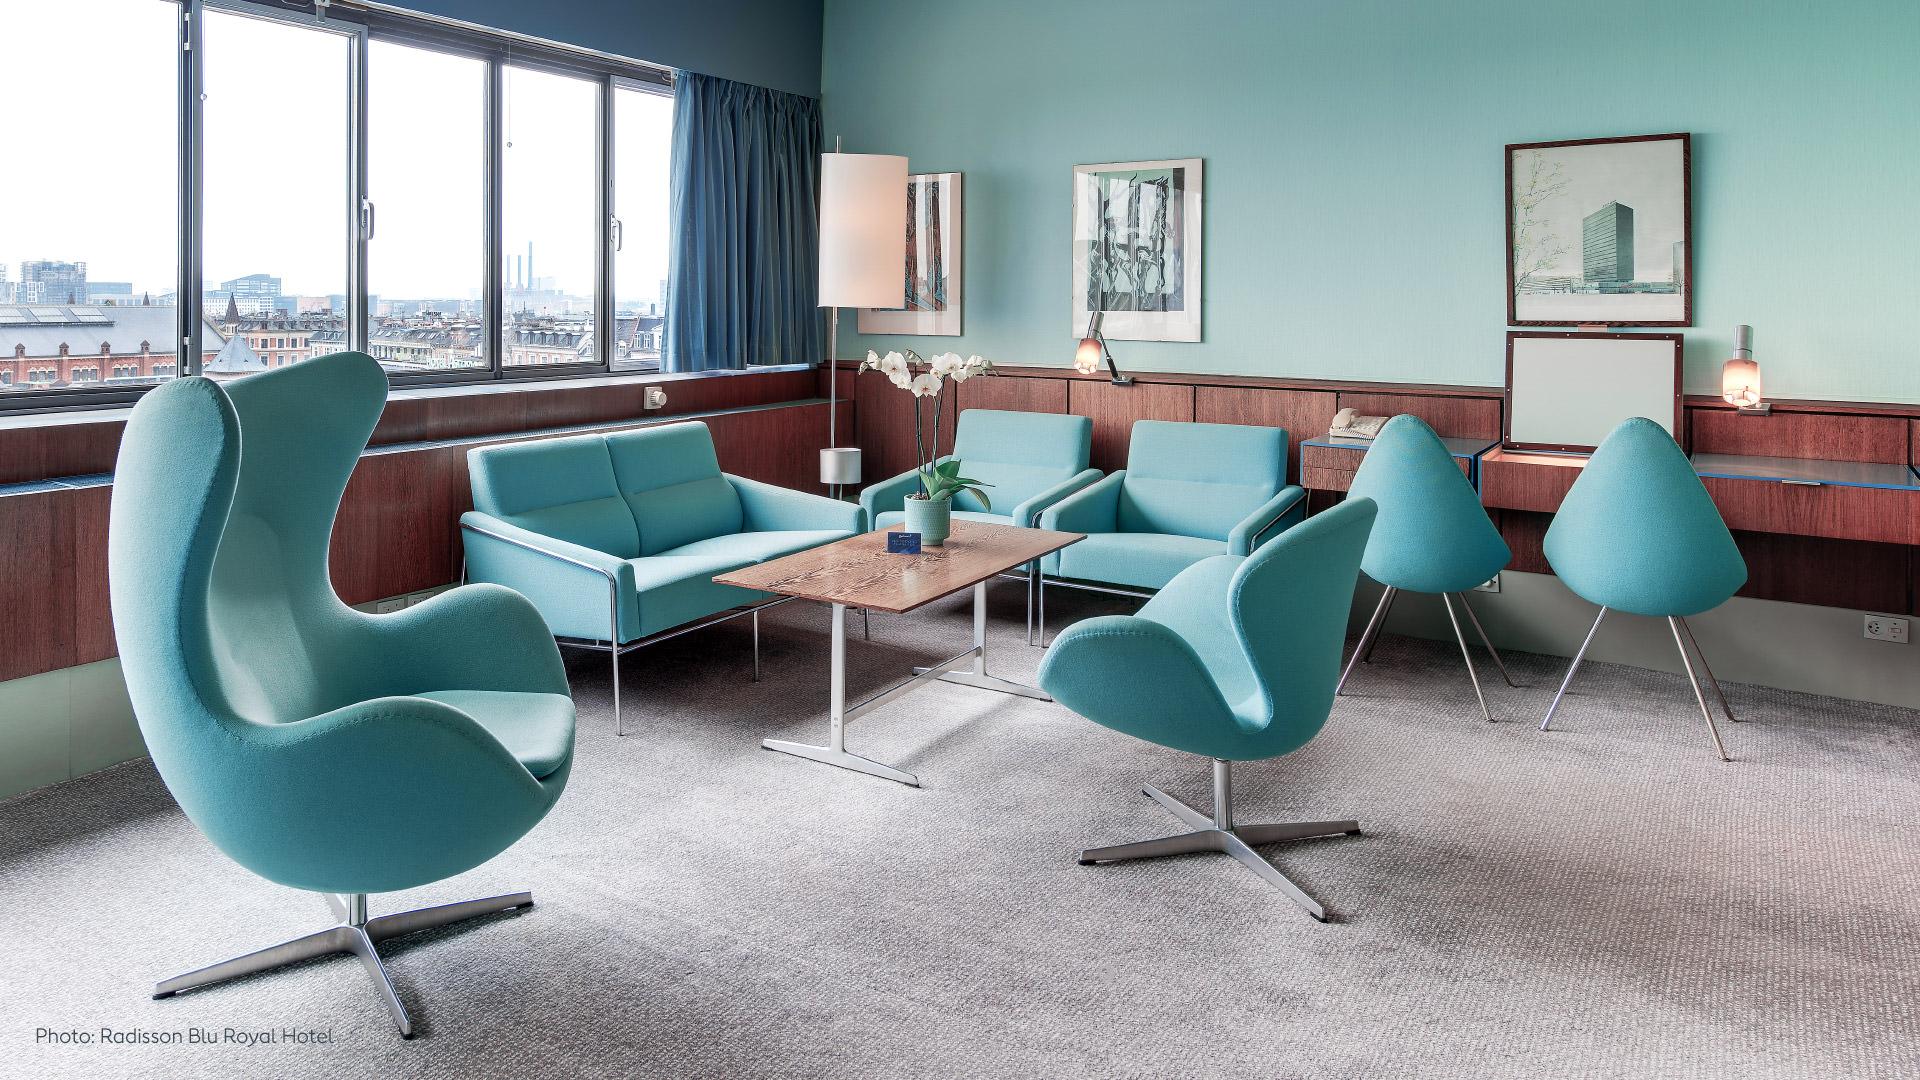 Radisson SAS Royal Hotel Room 606 by Arne Jacobsen for inspiration